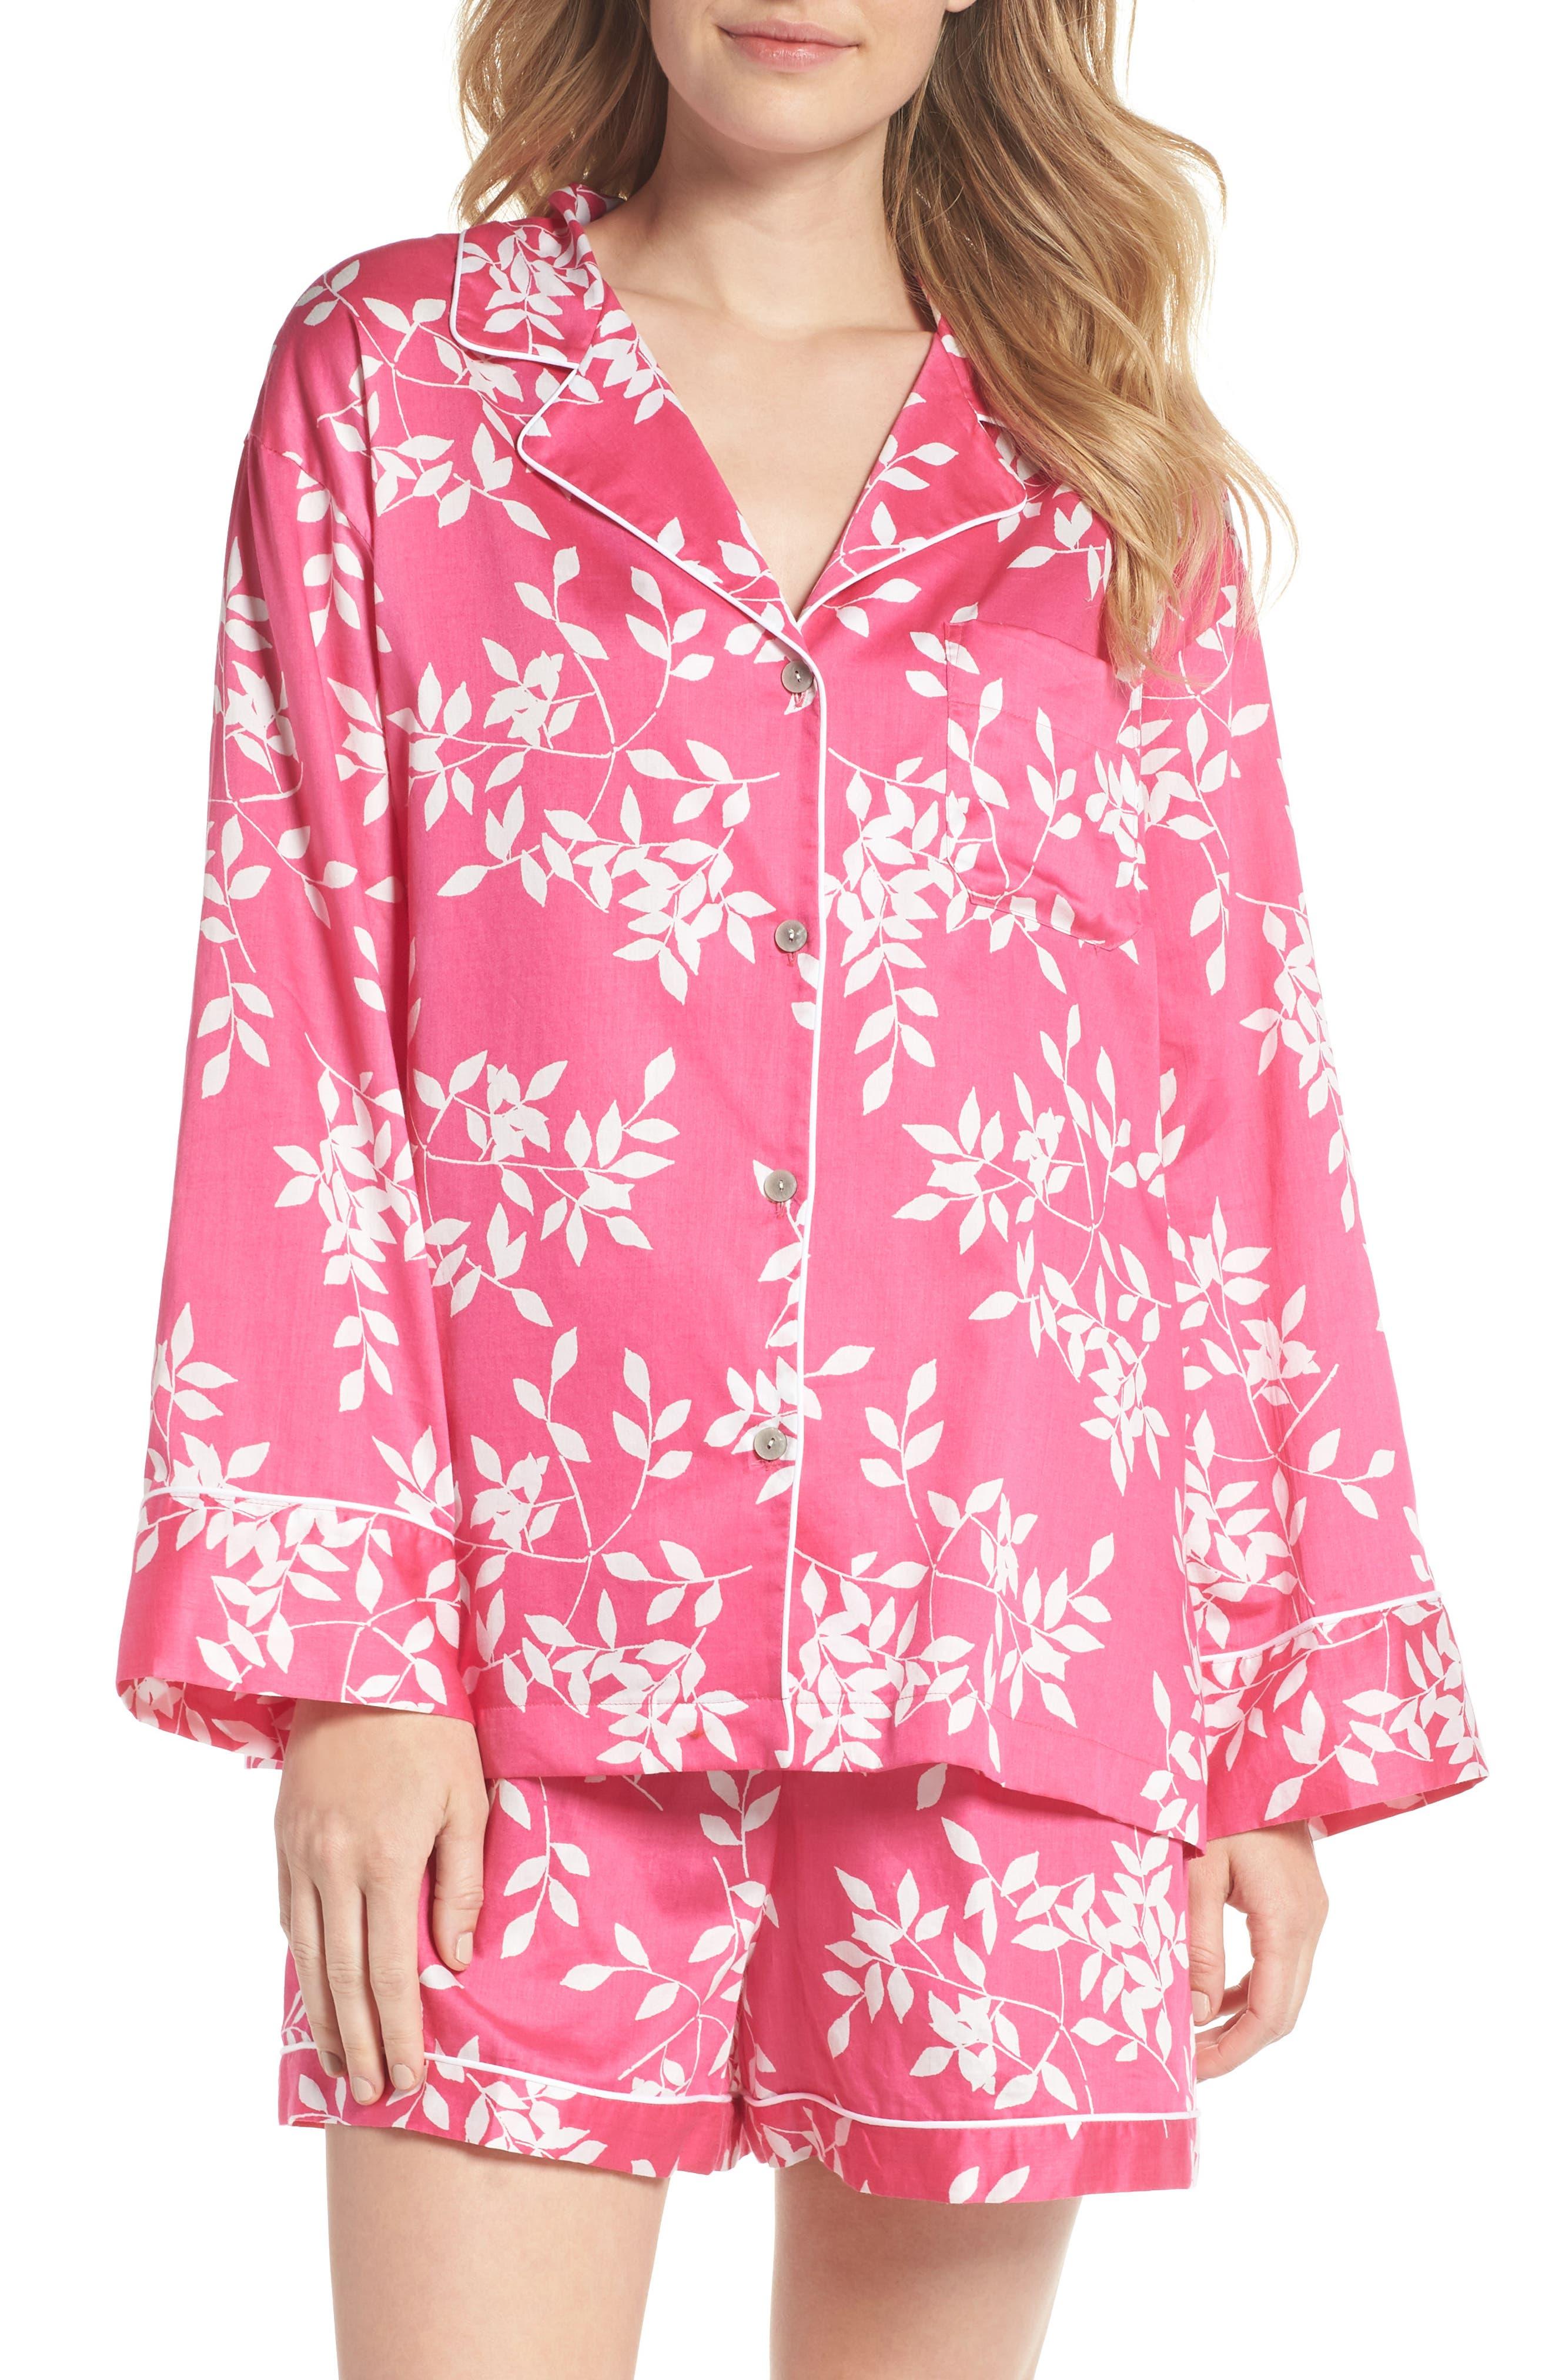 Branch Print Cotton Sateen Short Pajamas,                             Main thumbnail 1, color,                             Hibiscus Pink